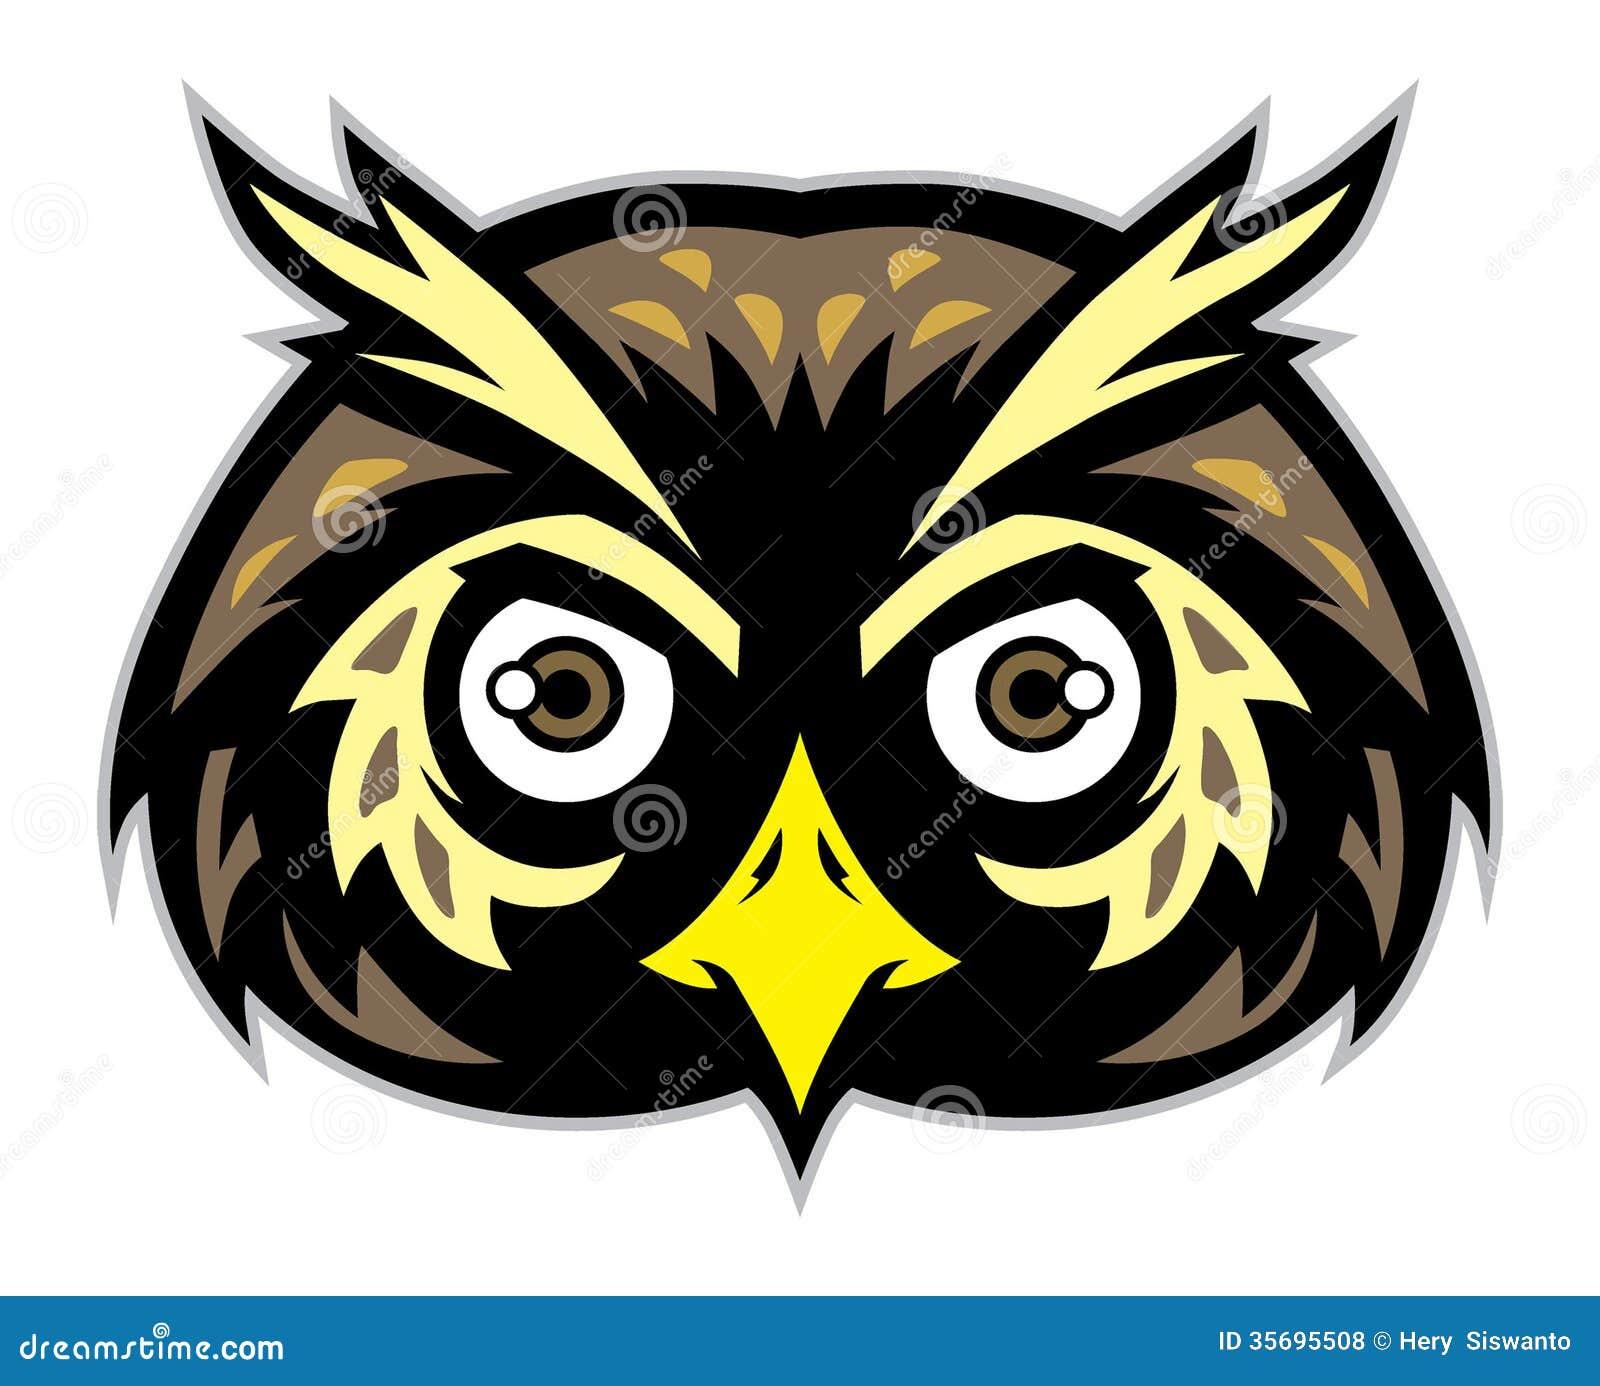 Owl Head Mascot Royalty Free Stock Photos - Image: 35695508